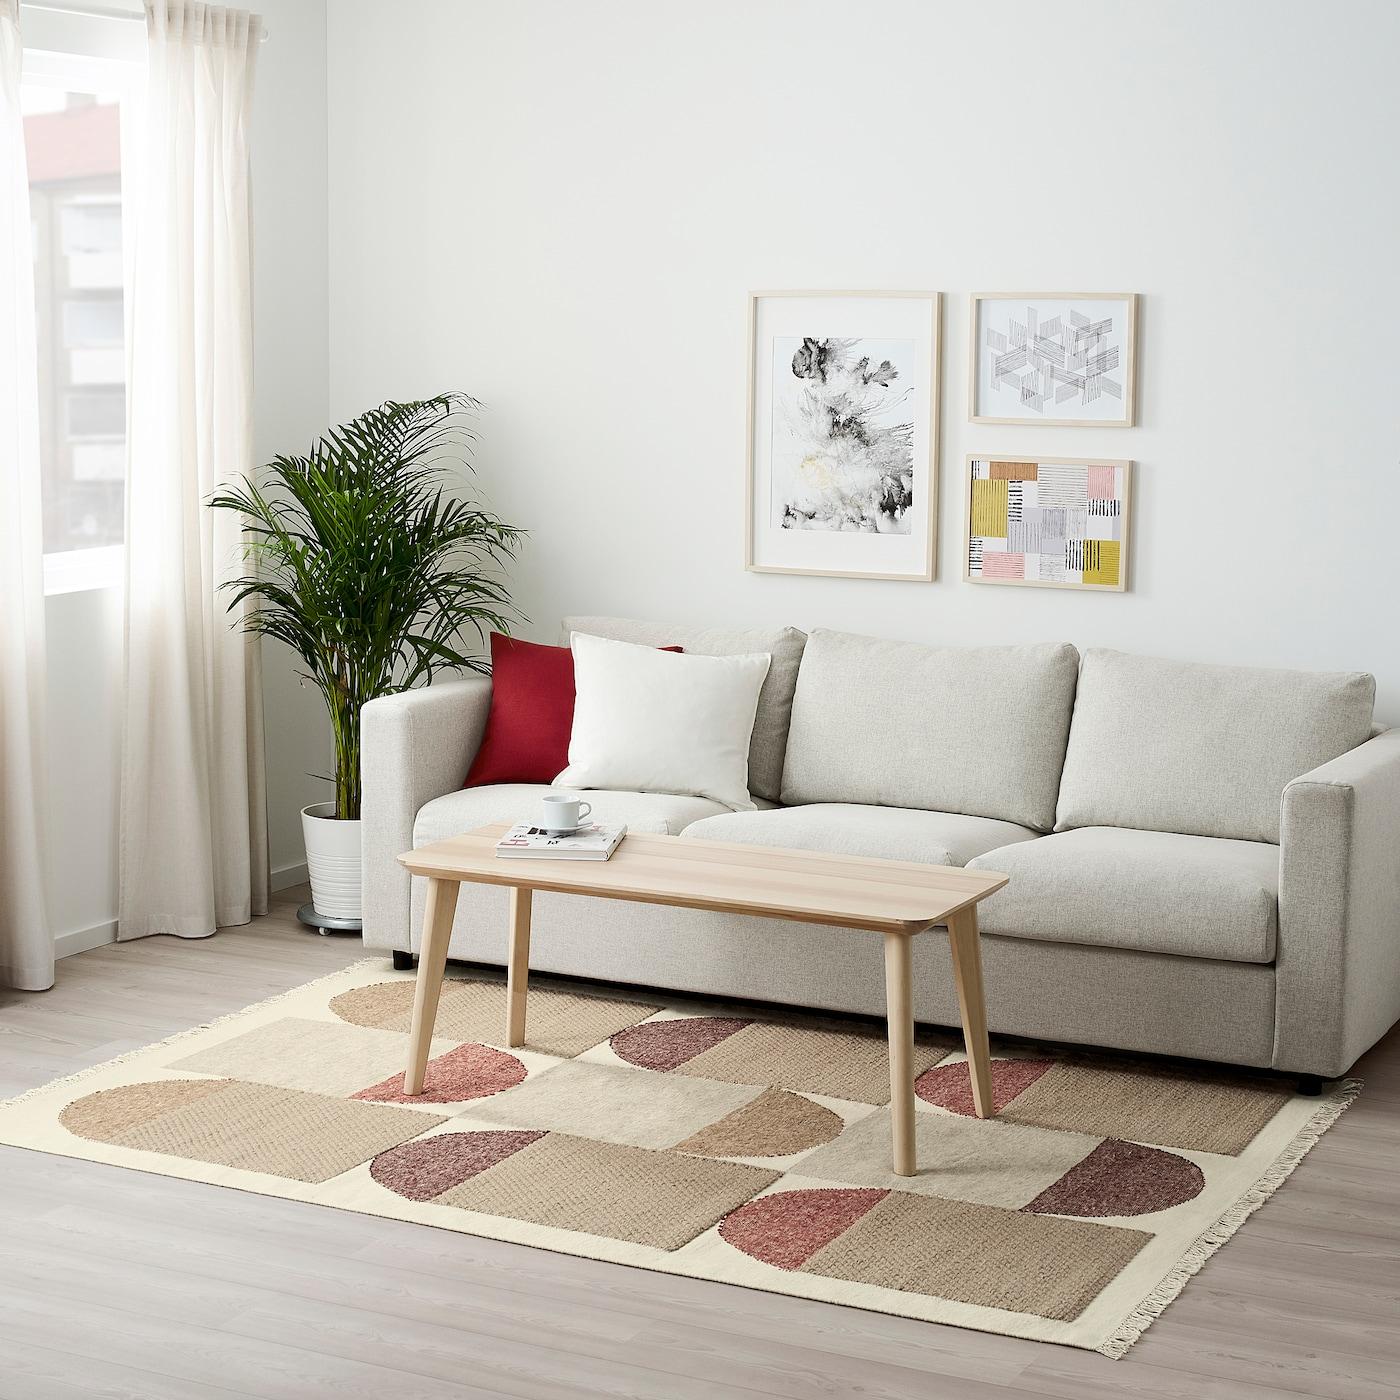 Picture of: Spangsbro Taeppe Fladvaevet Handlavet Multifarvet Ikea